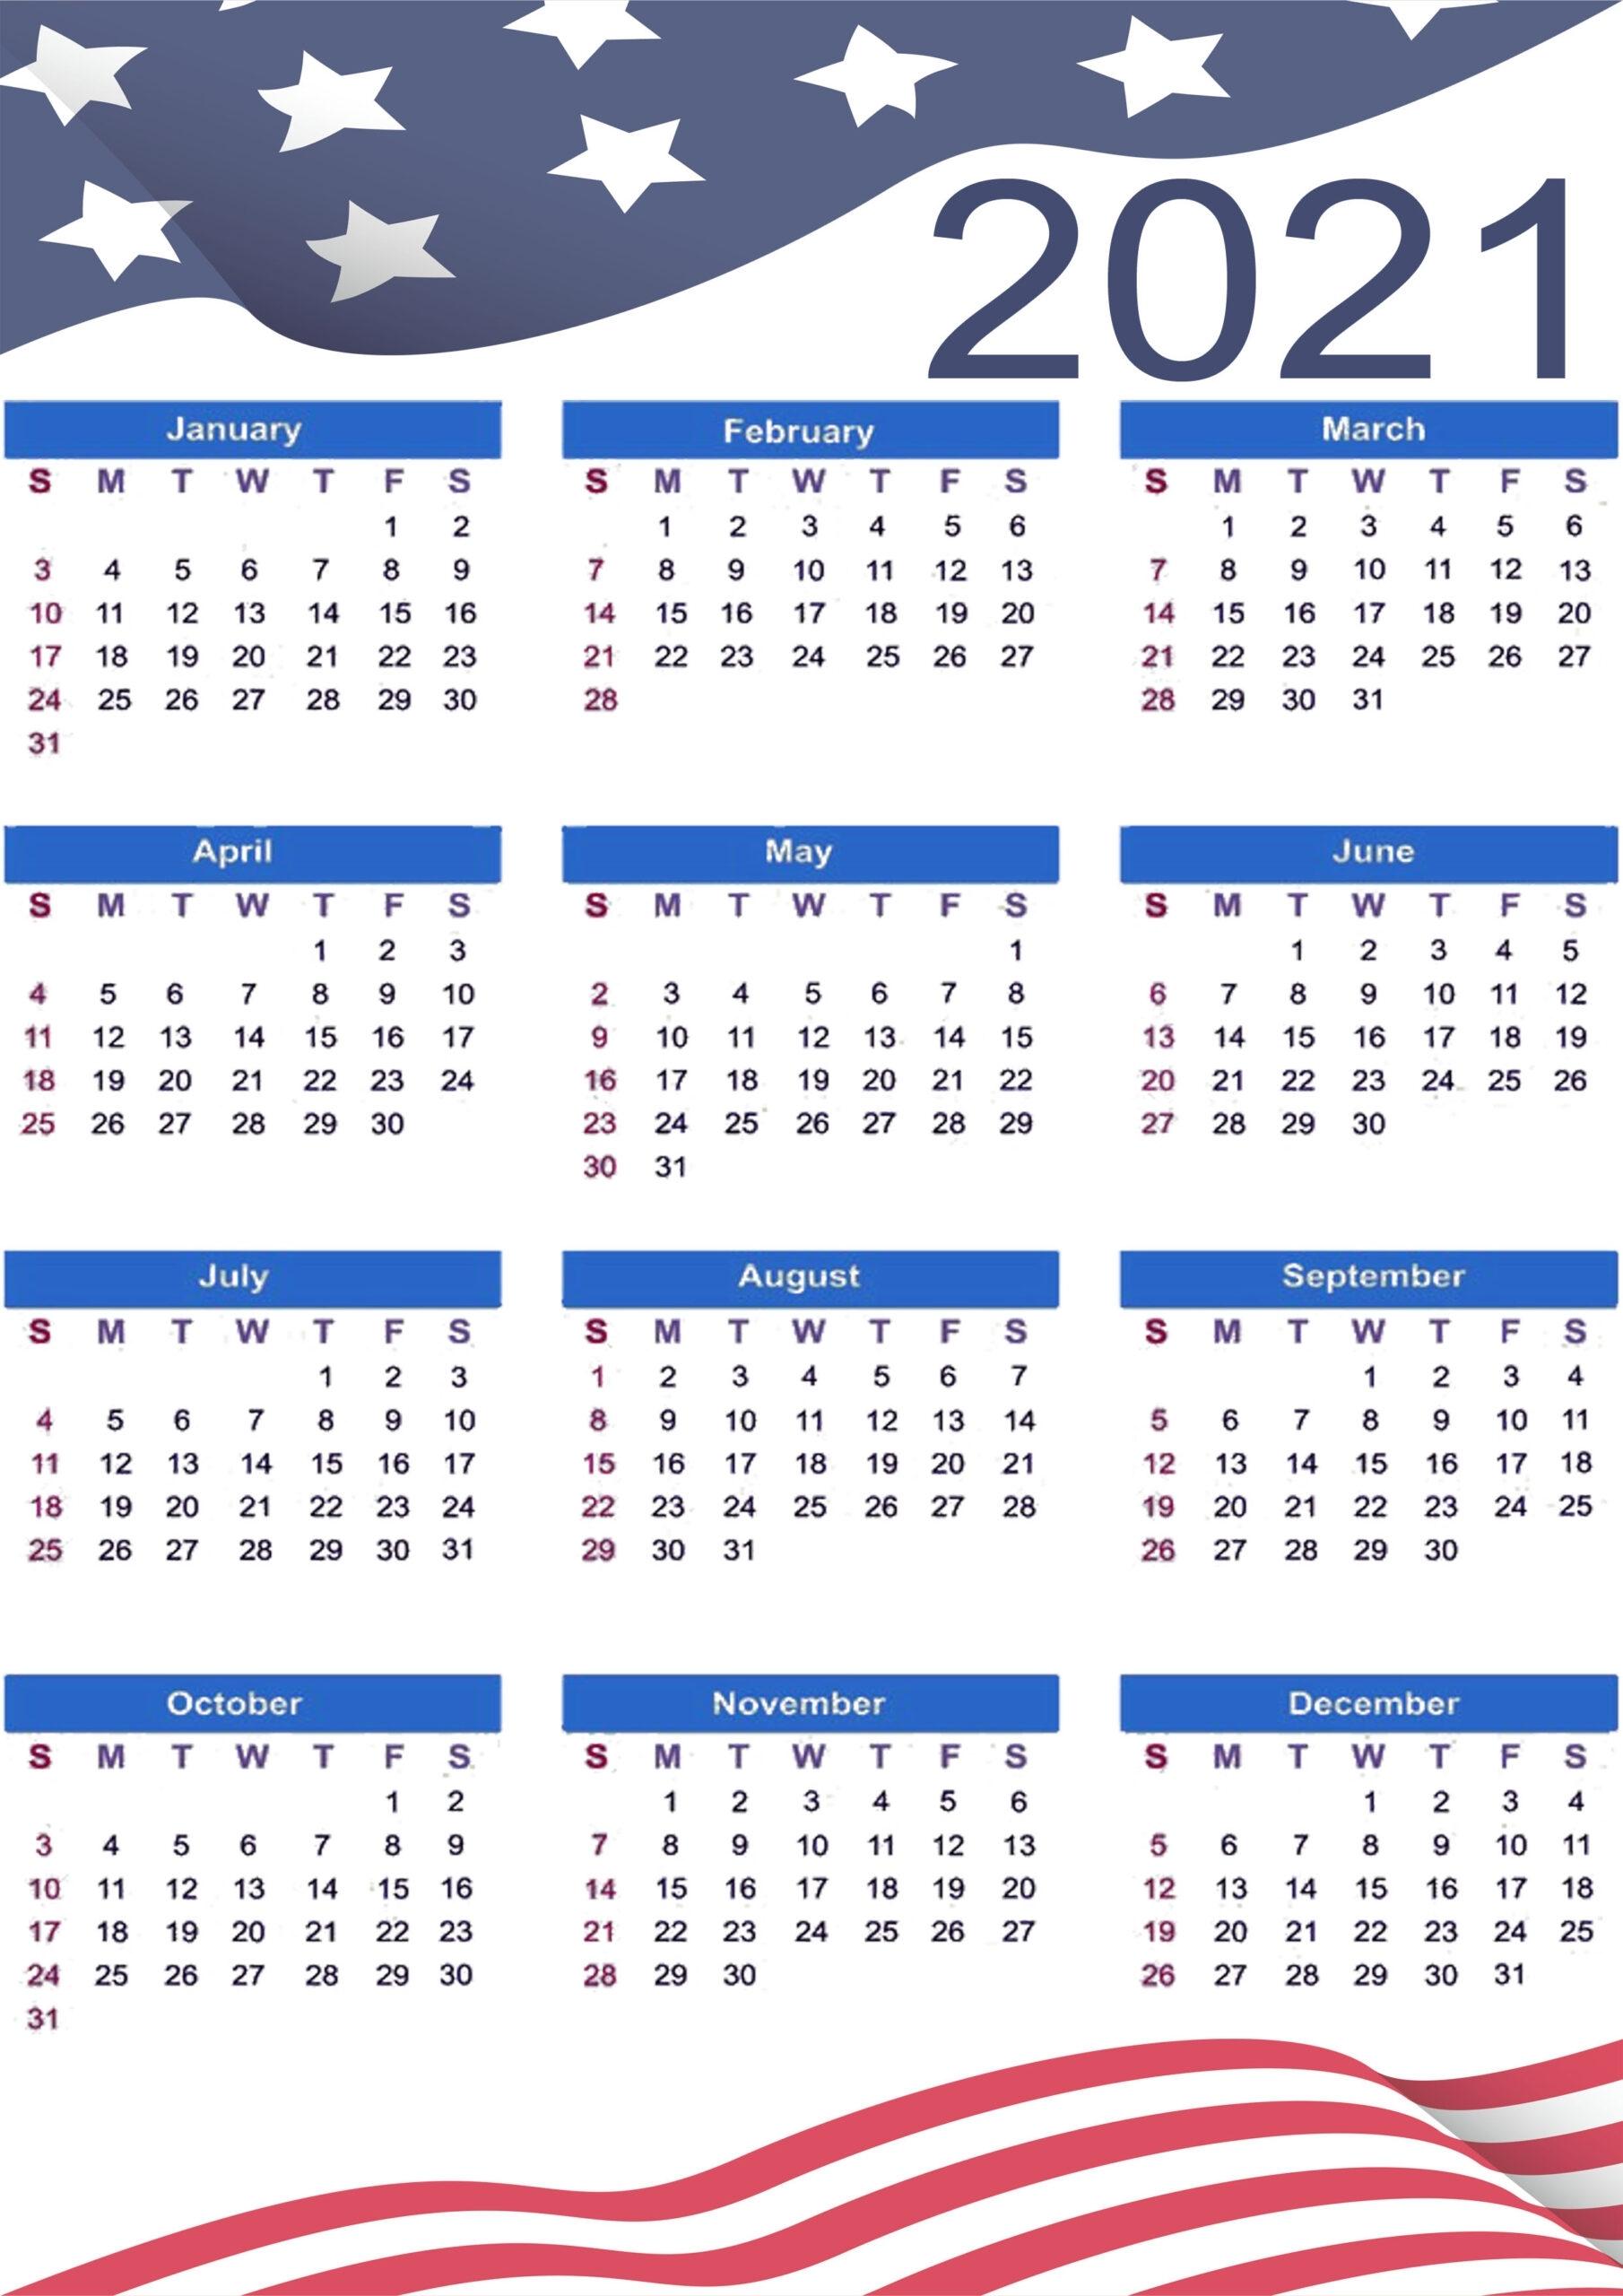 Printable 2021 Us Calendar With Holidays, Federal, Bank & Observation